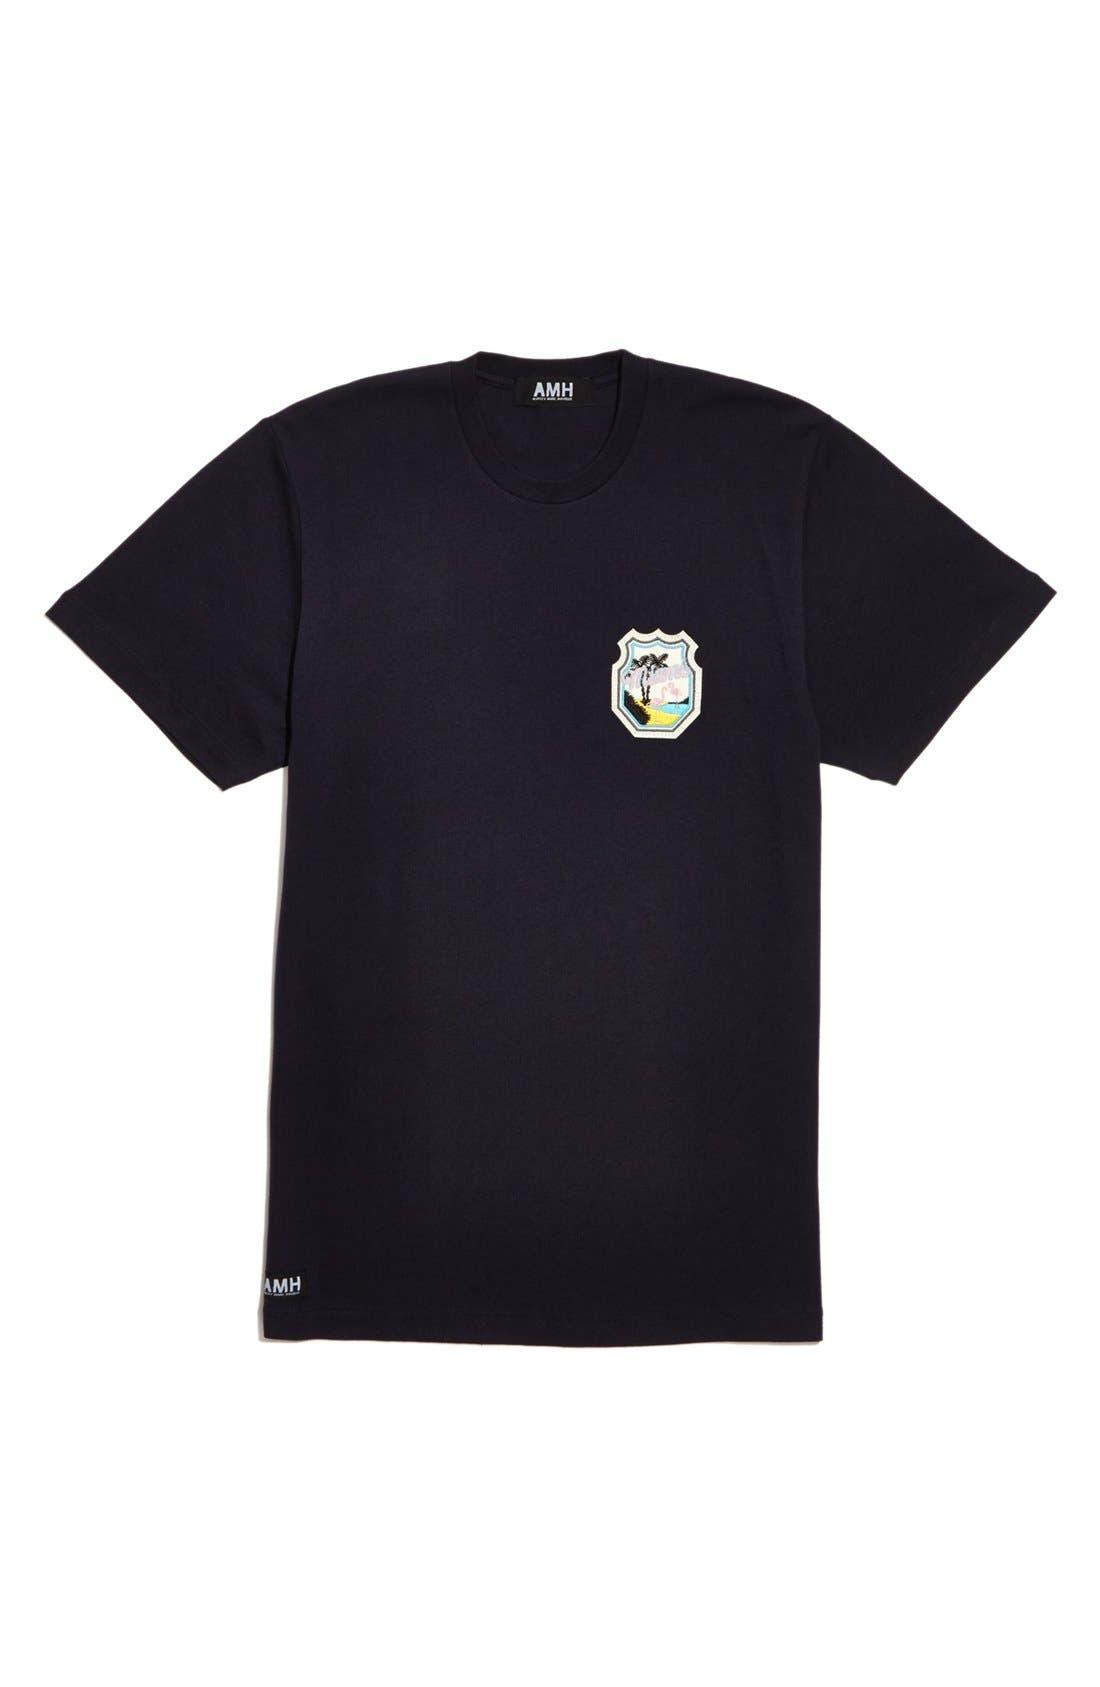 Main Image - AMH - Ashley Marc Hovelle 'Miami City Badge' T-Shirt